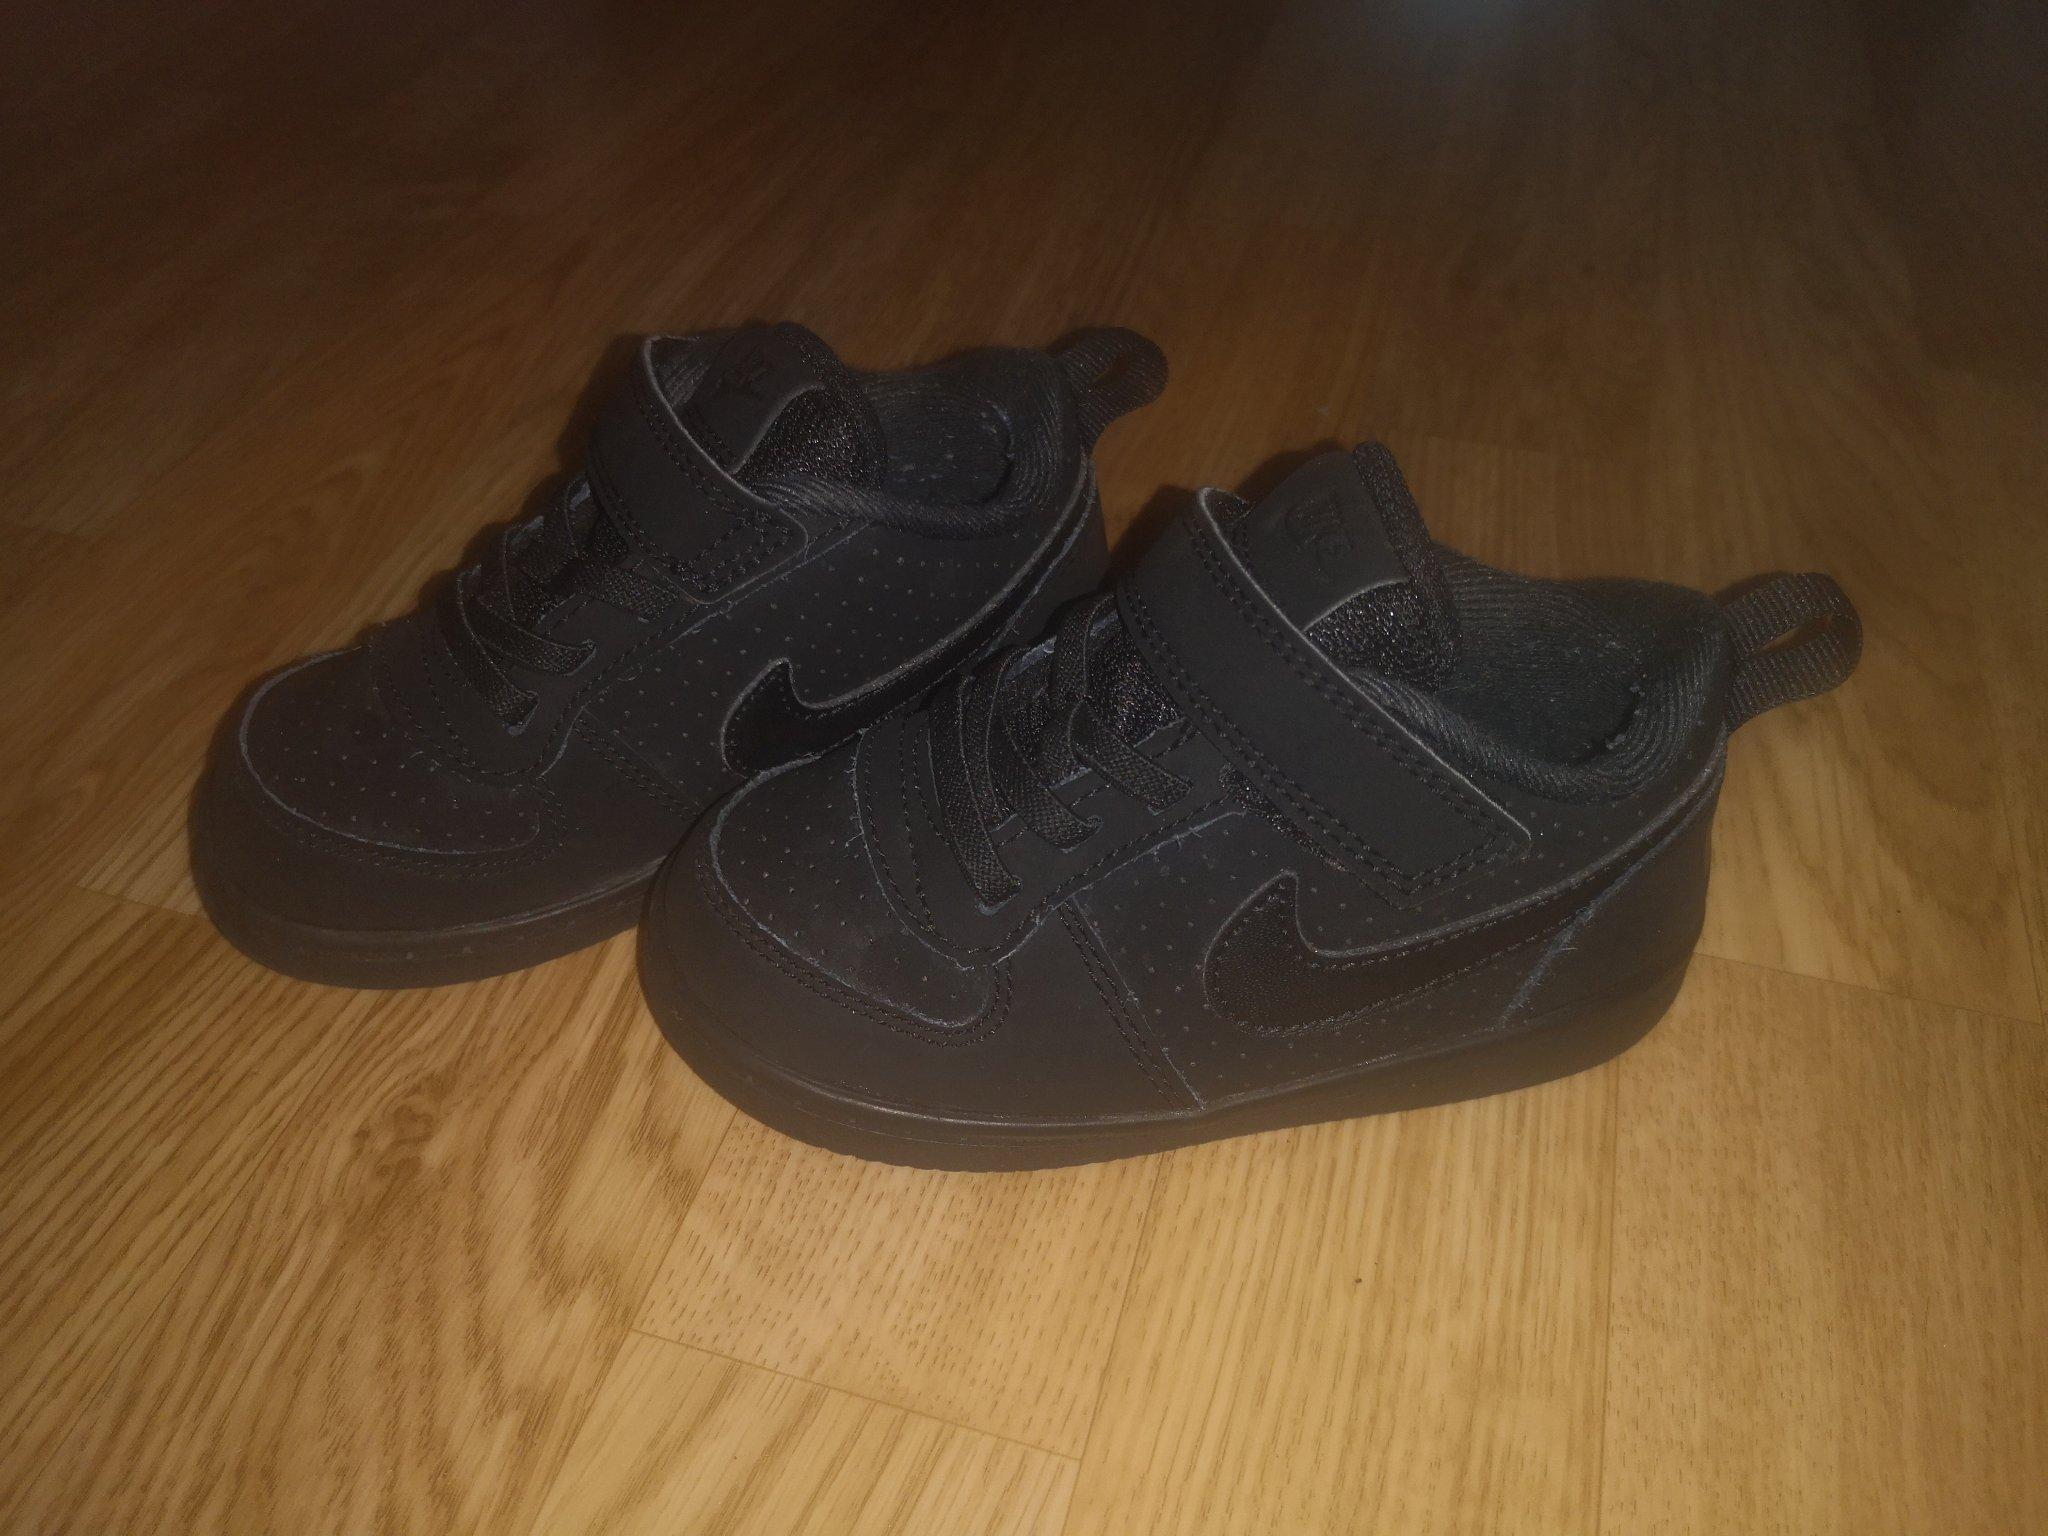 Nike skor svarta nike storlek 23,5 superfina i fint skick!